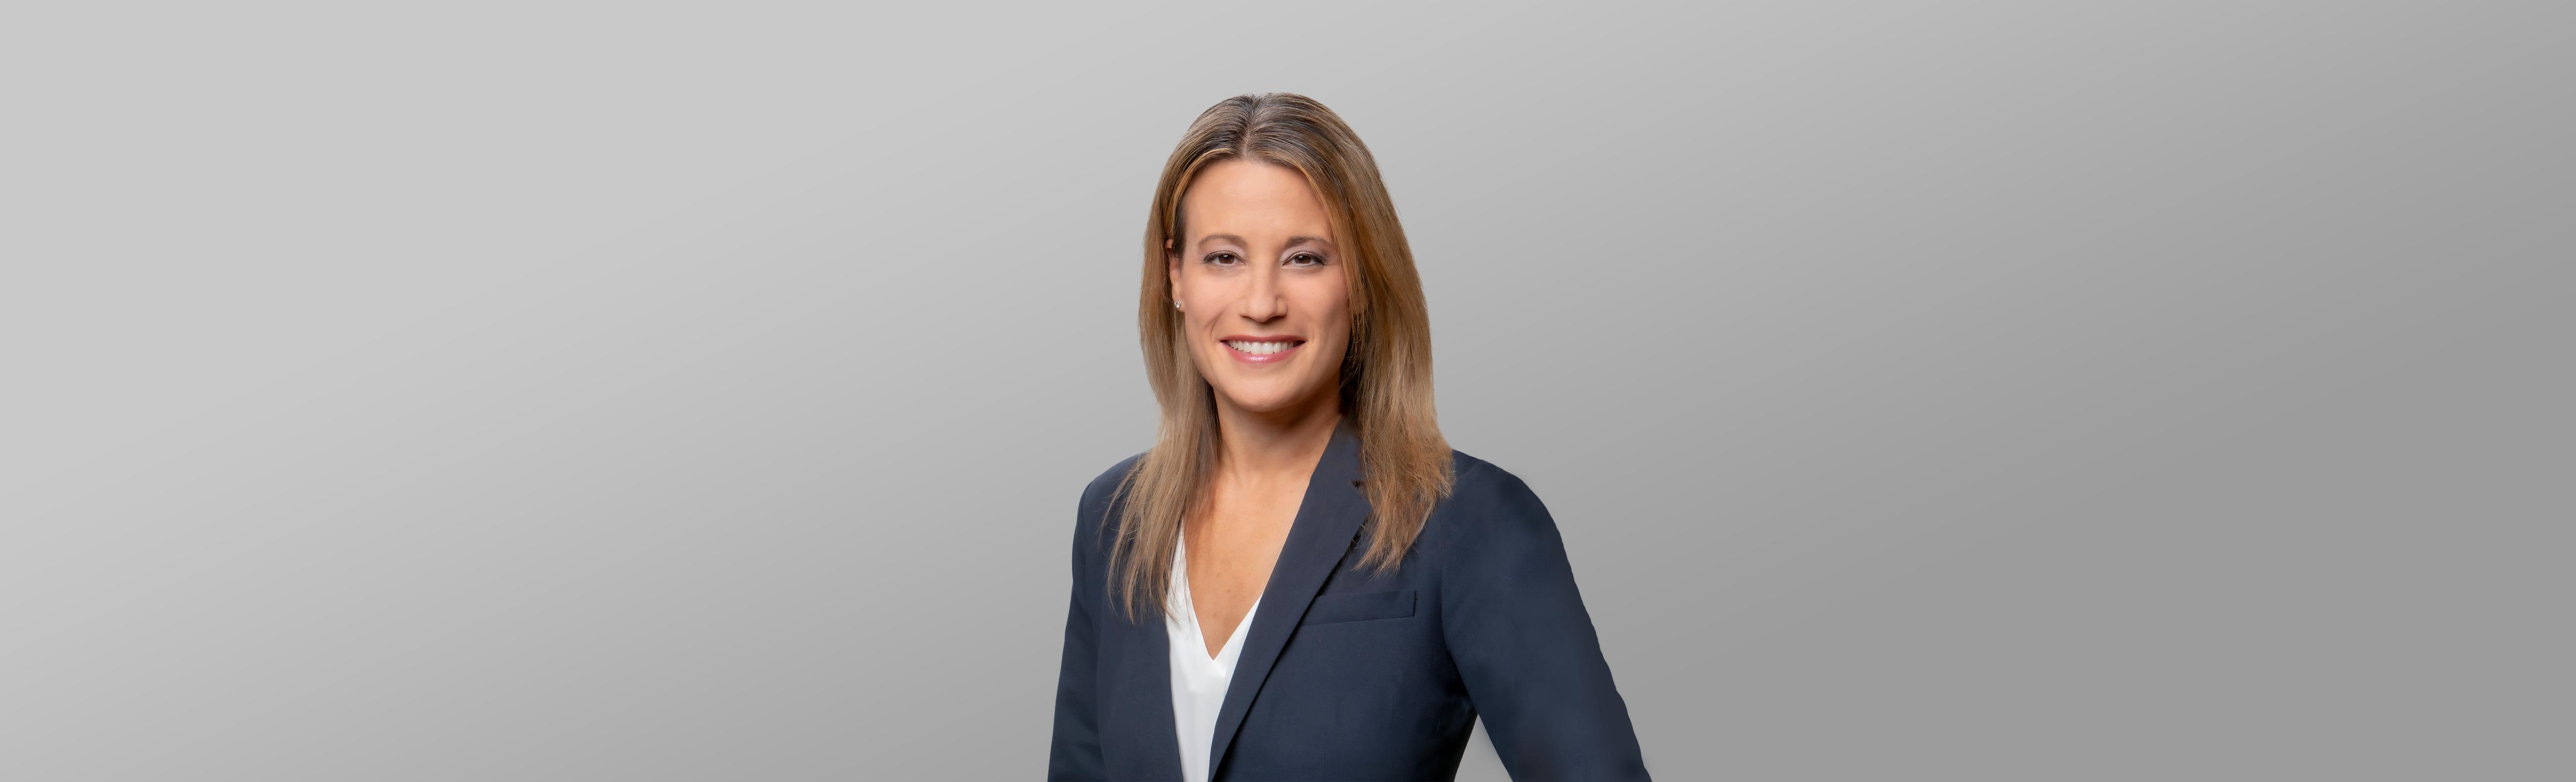 Photo of RachelStahler, Chief Information Officer